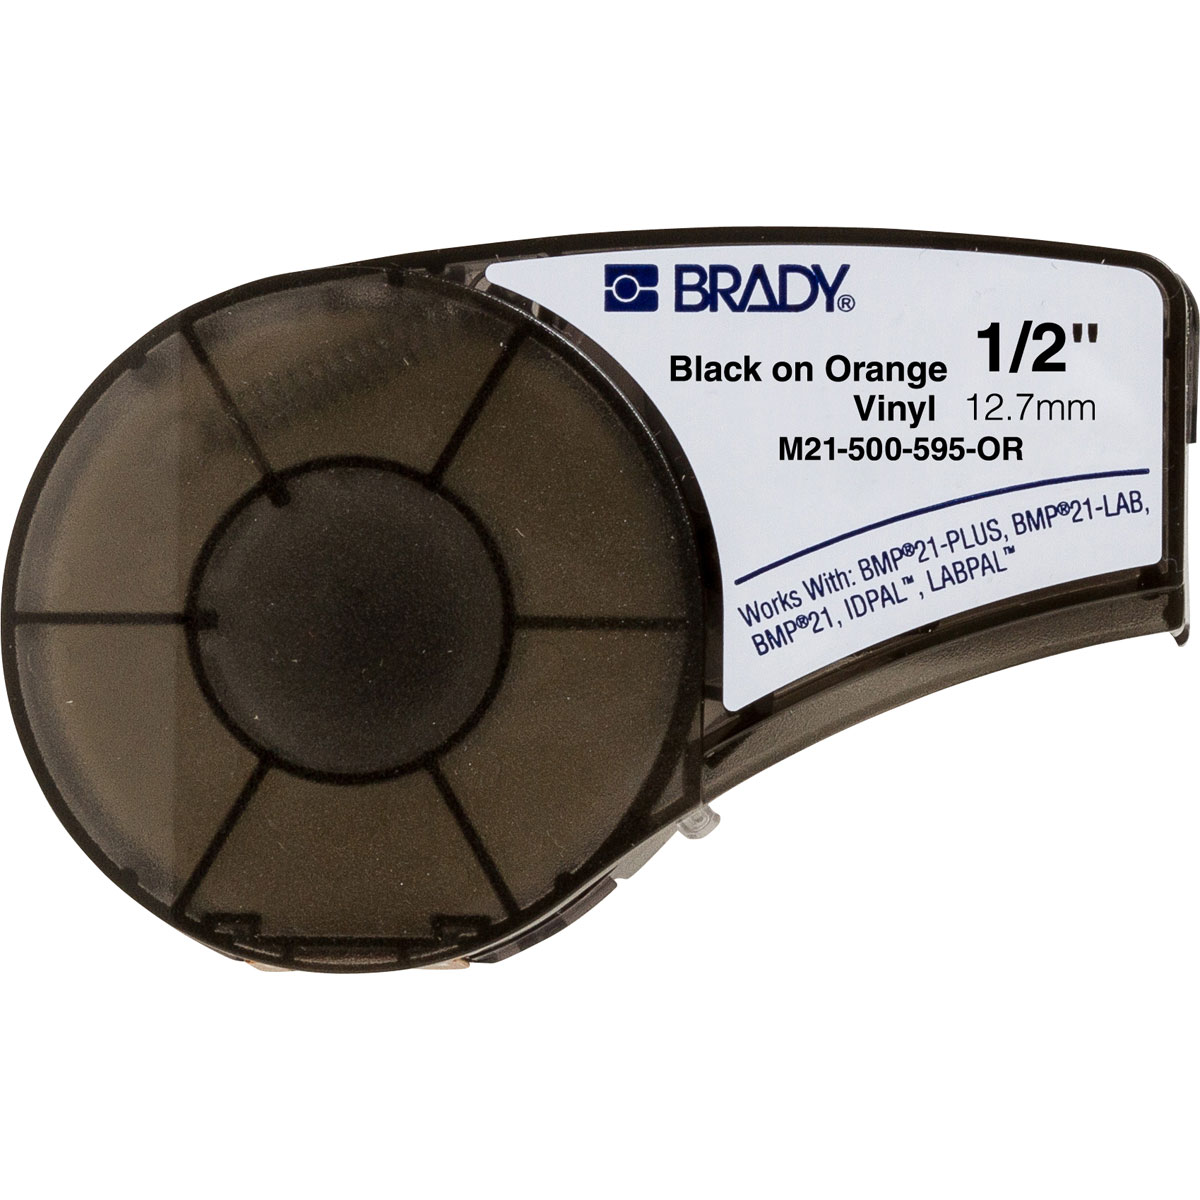 Brady® Prinzing® T218 Scissor Action Standard Lockout Hasp, 6 Padlocks, 0.47 in Dia Max Padlock Shackle, Steel